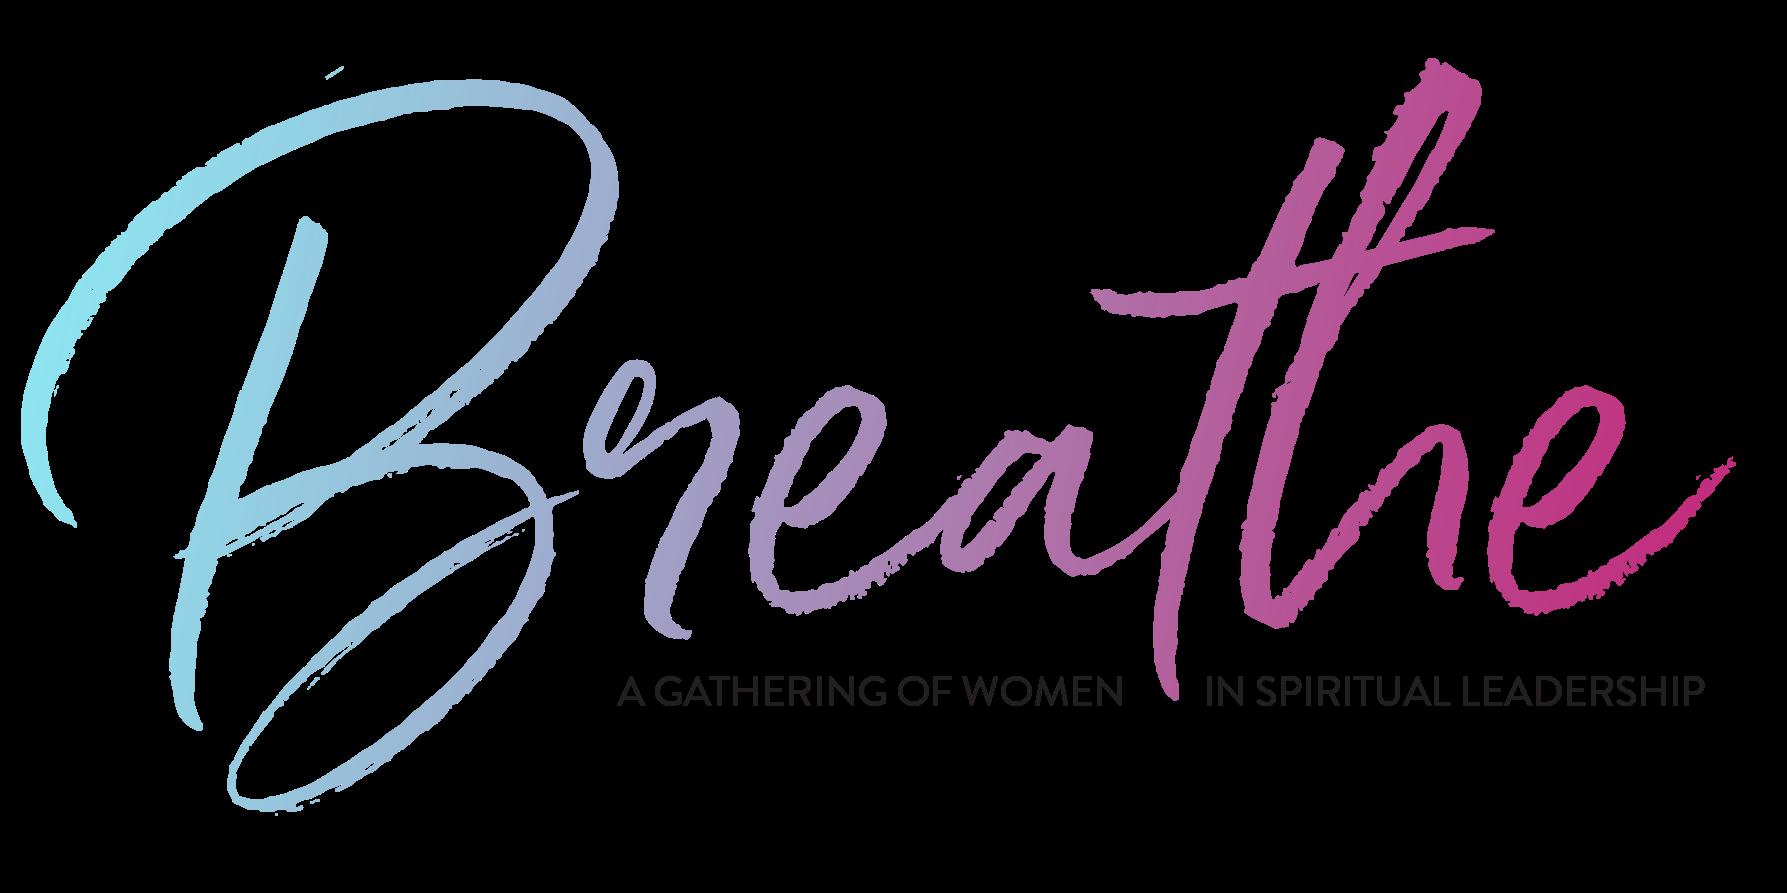 Breathe: A Gathering for Women in Spiritual Leadership